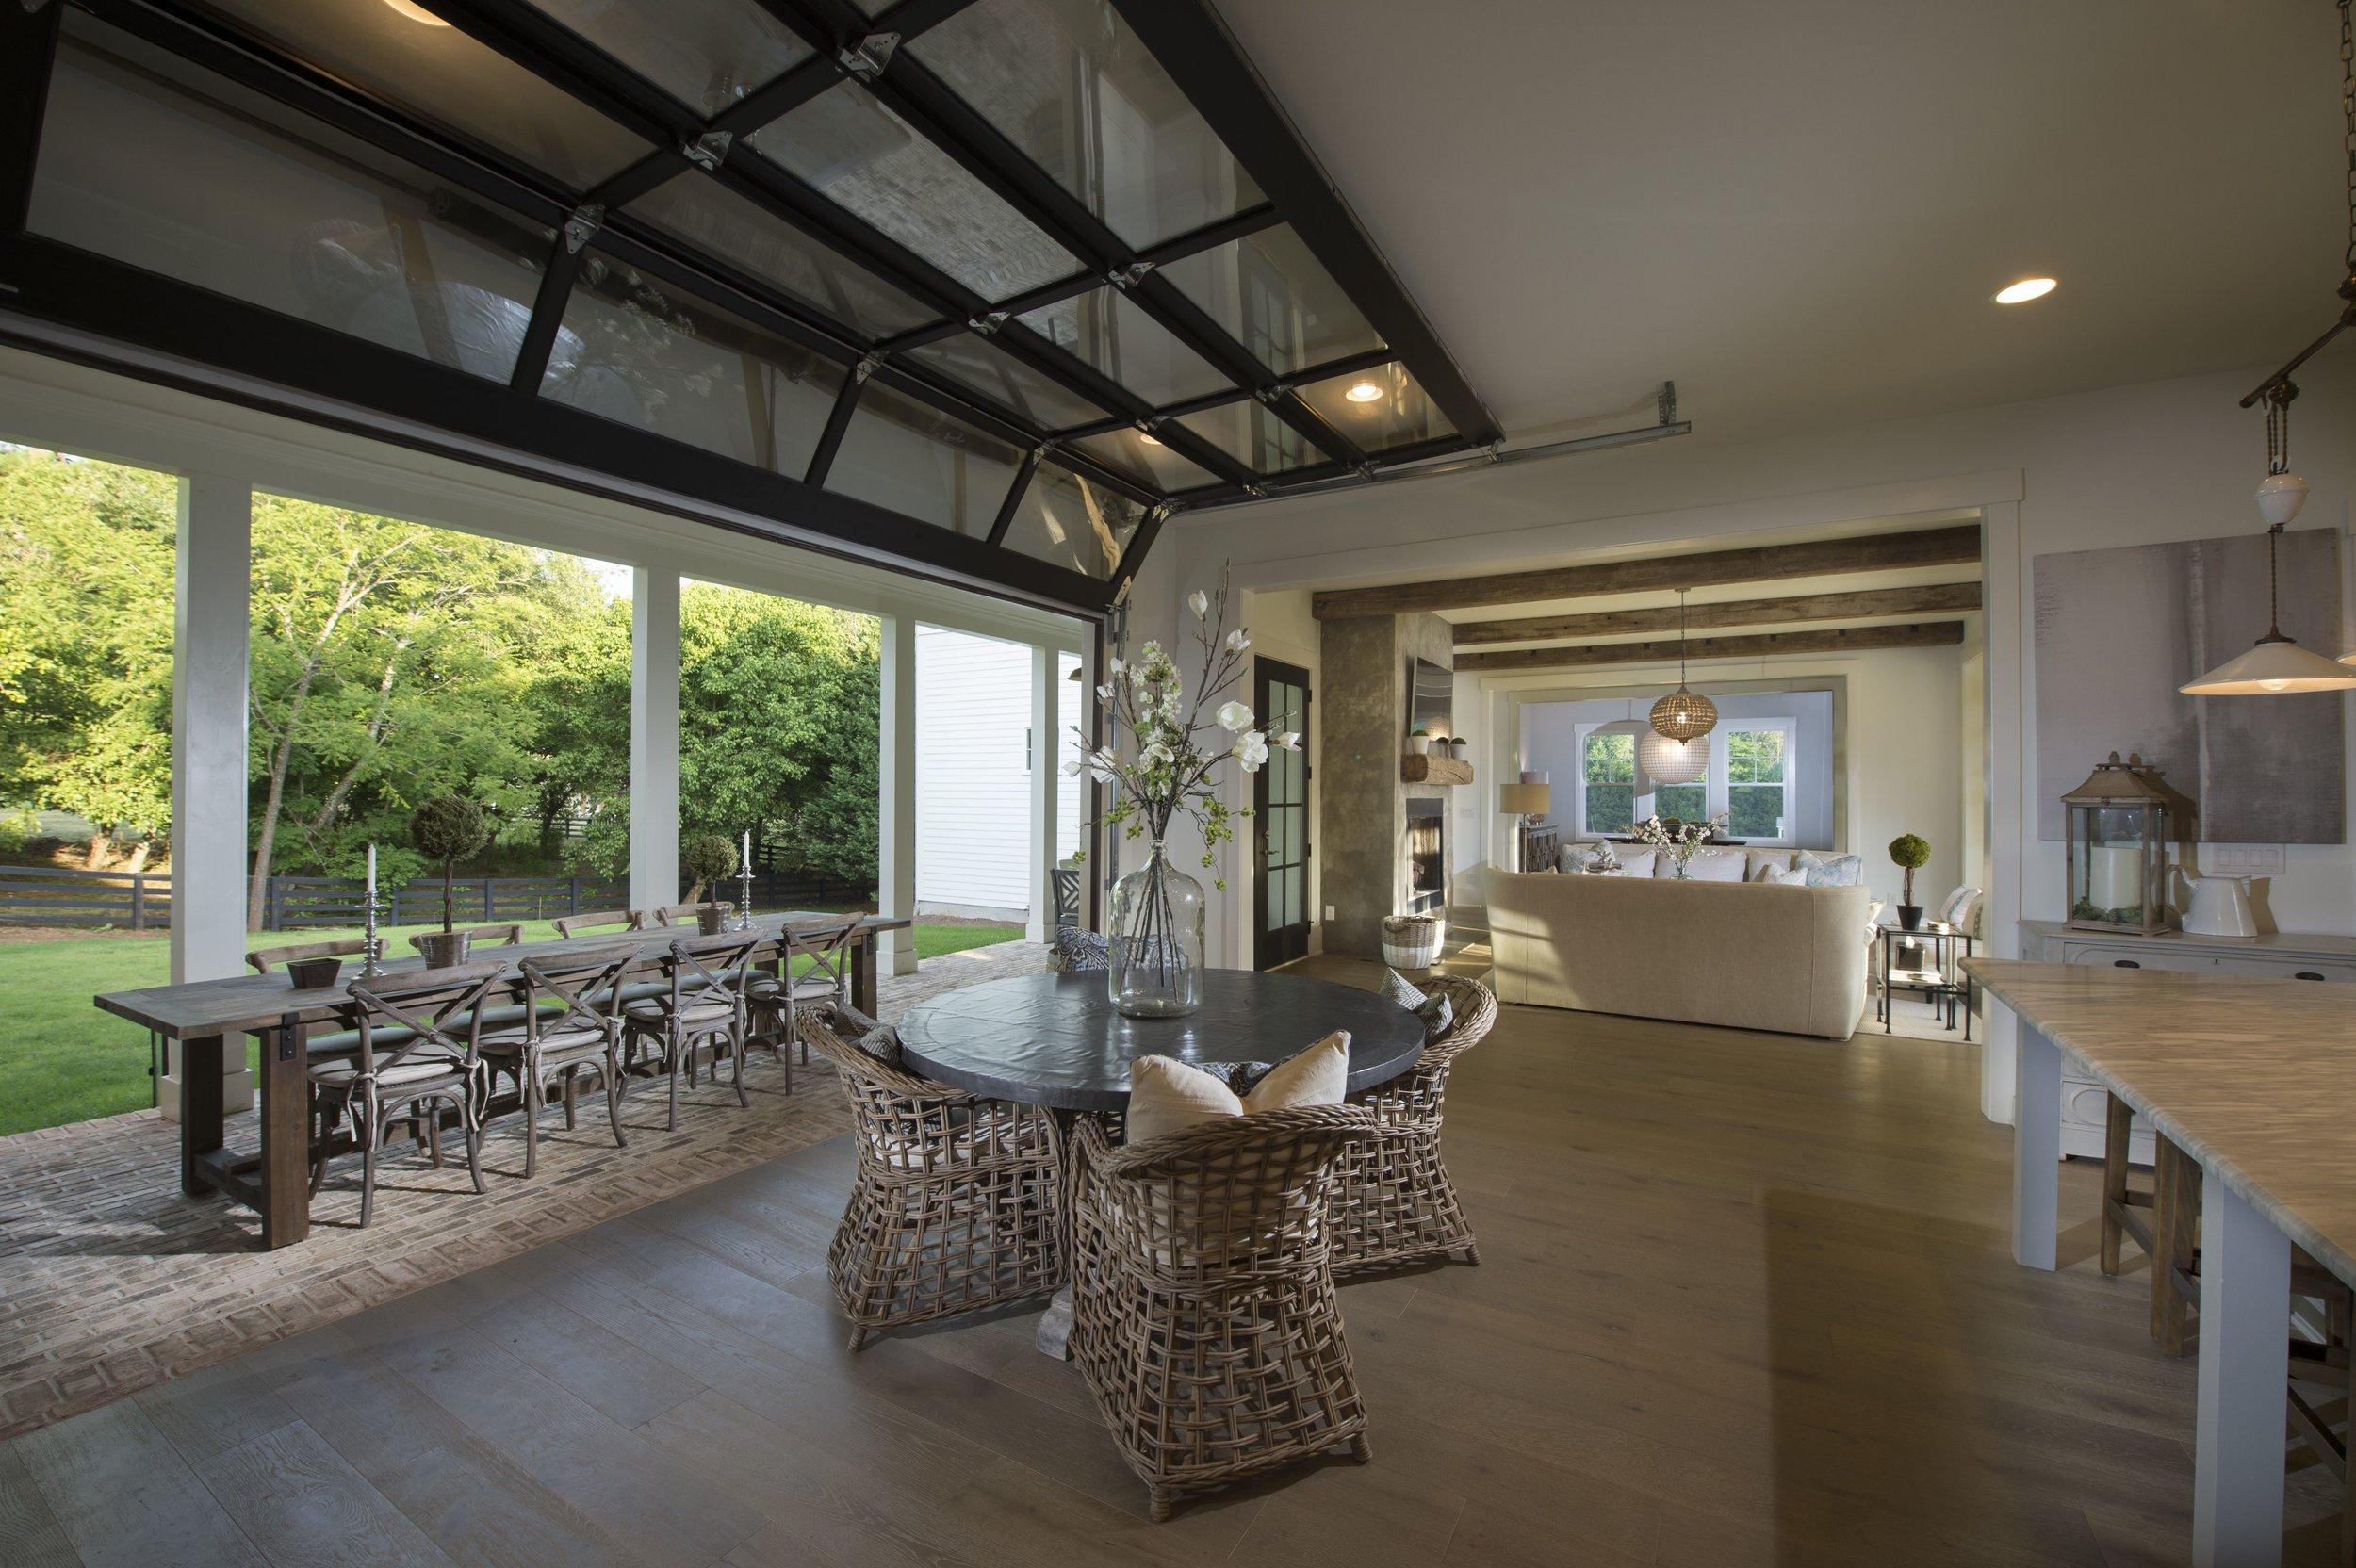 Demars Architecture and Design